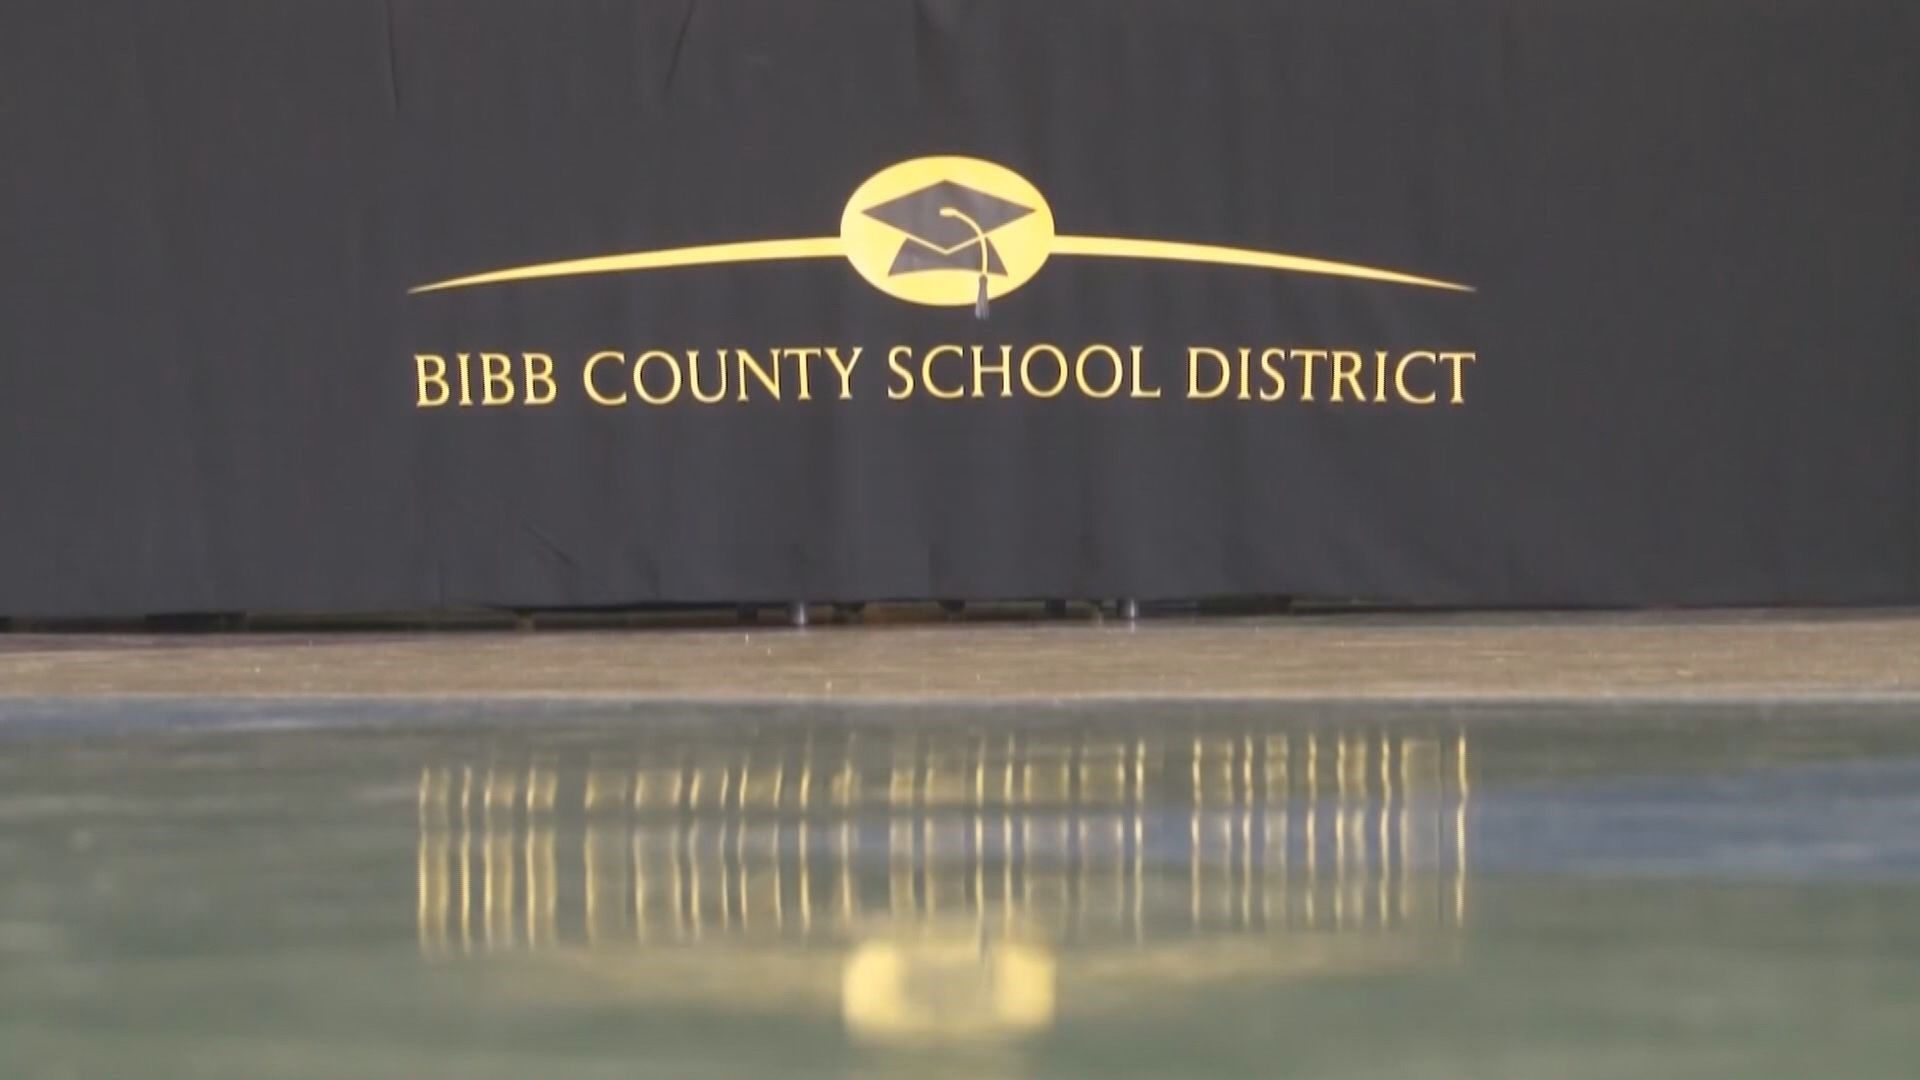 Uga Academic Calendar 2021-22 Bibb County Schools considers two options for 2021 22 calendar